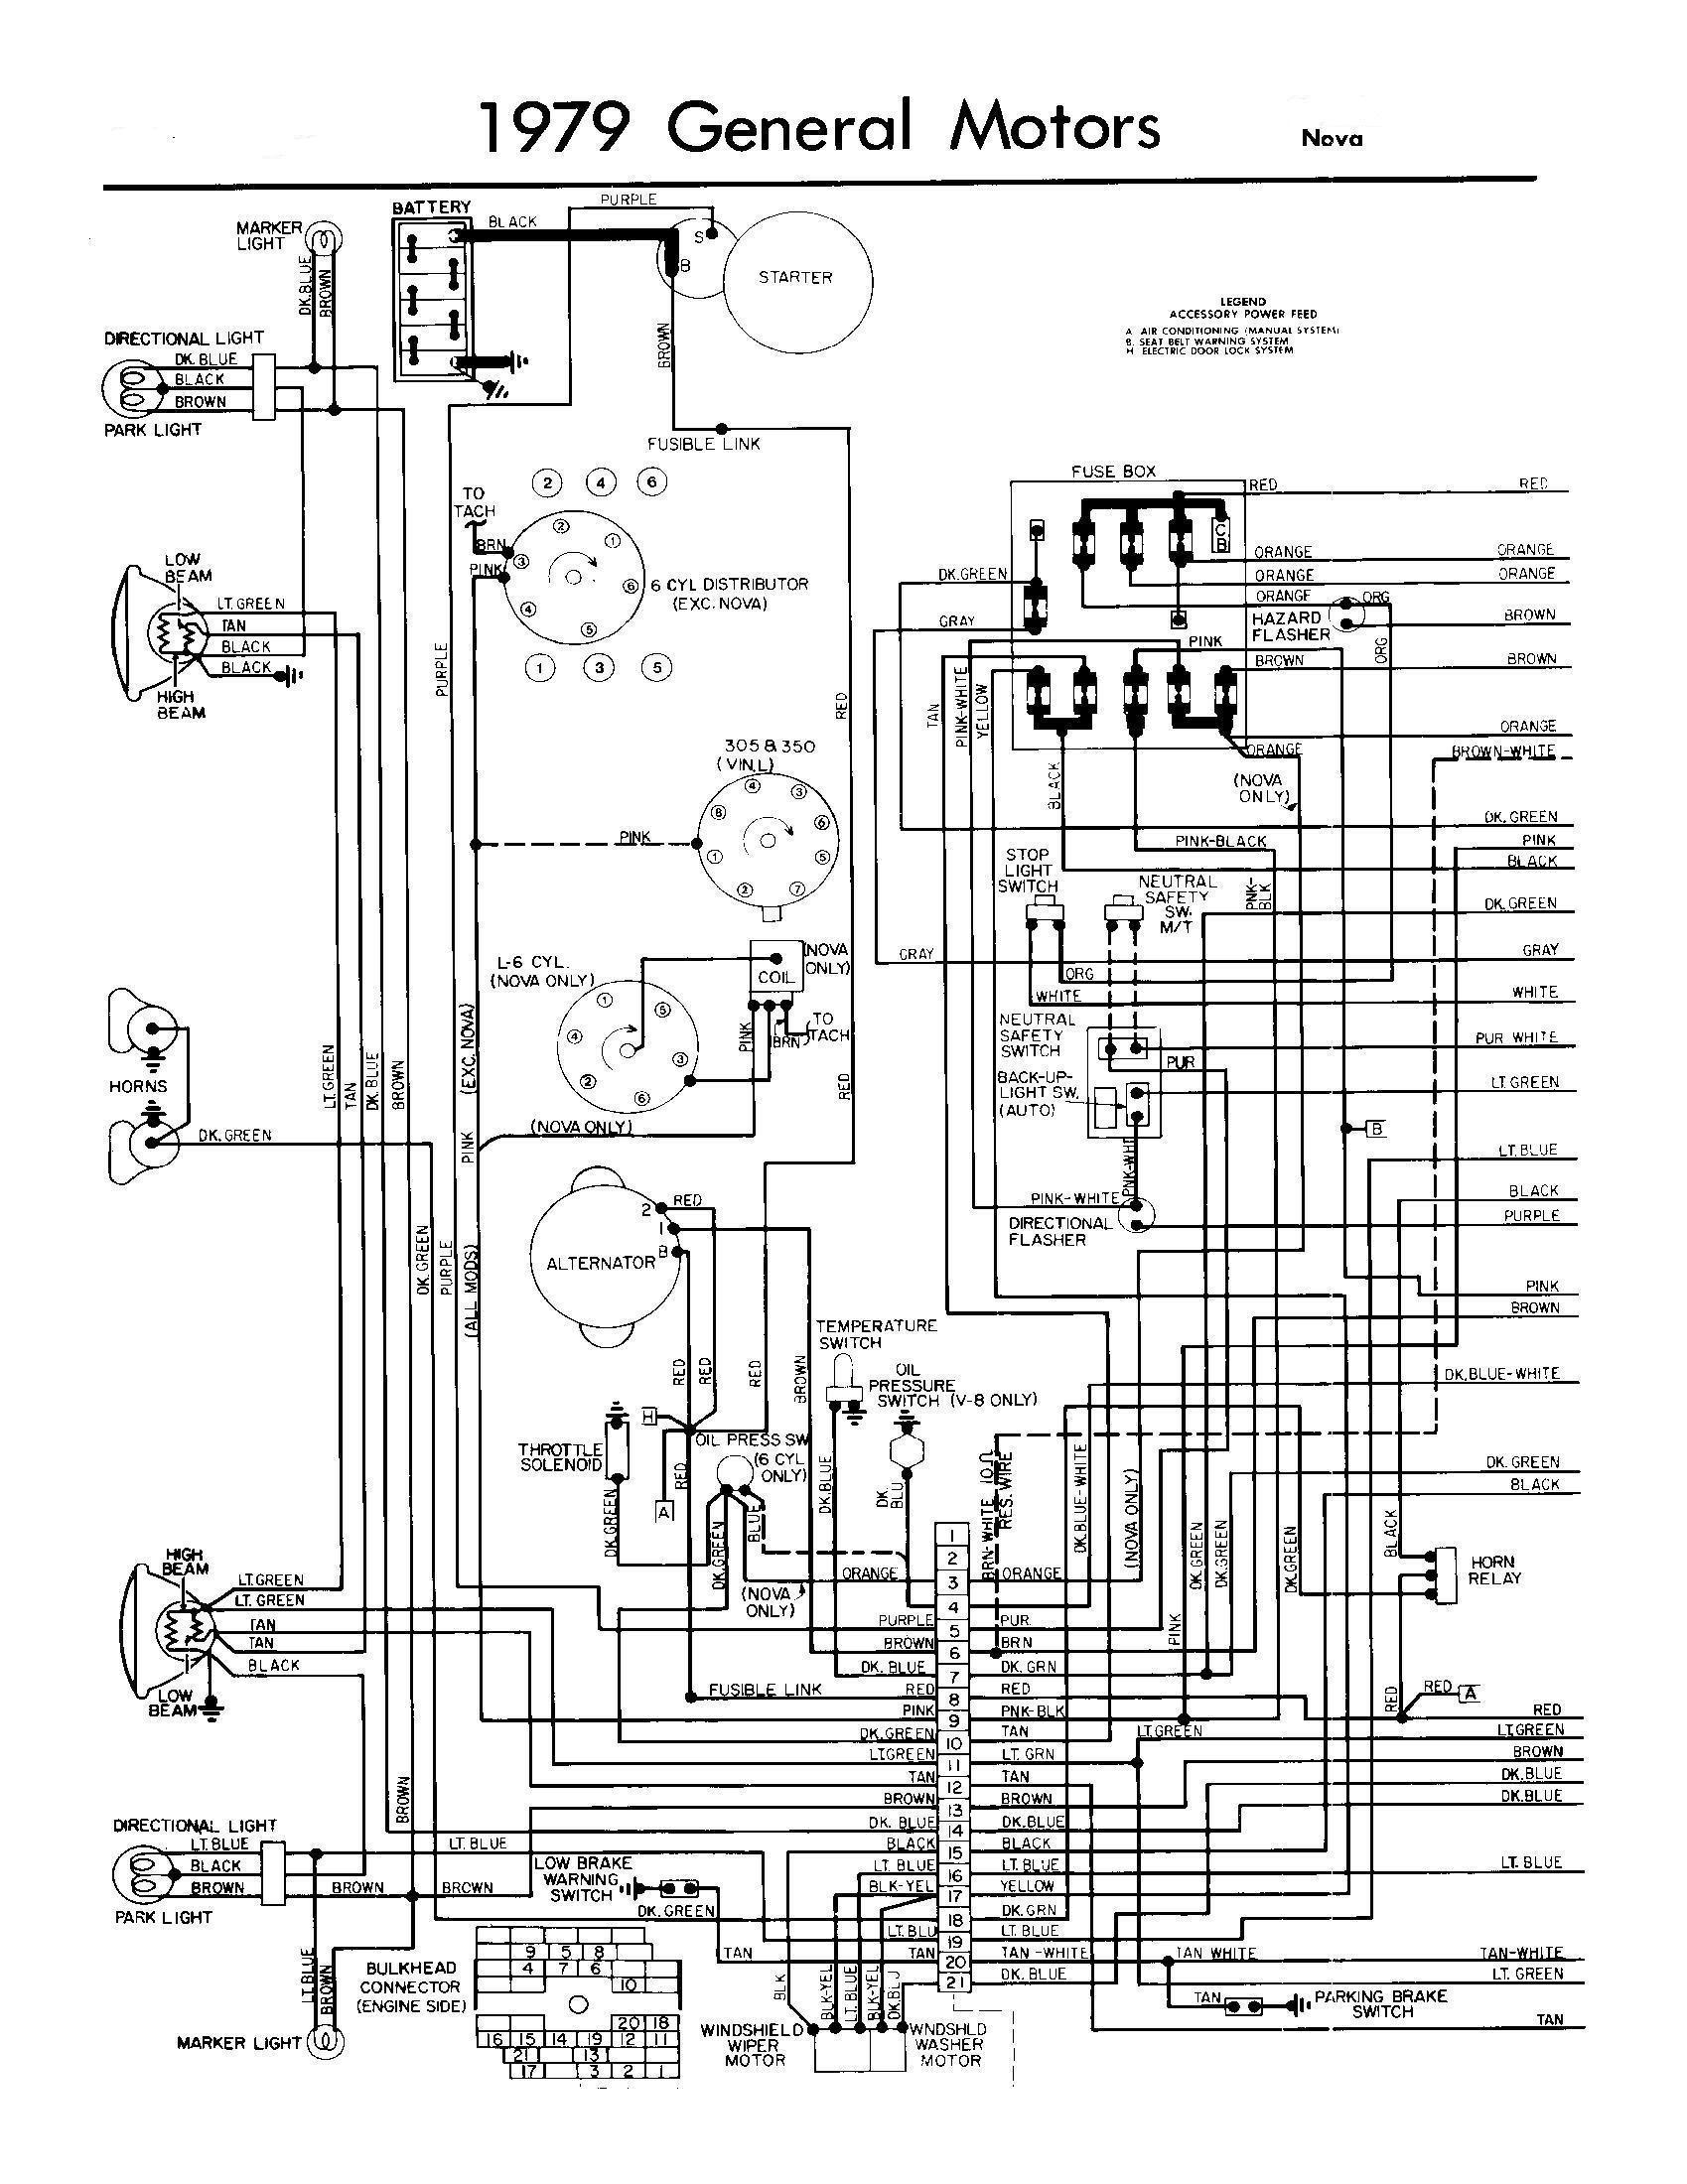 1969 chevy impala wiring diagram